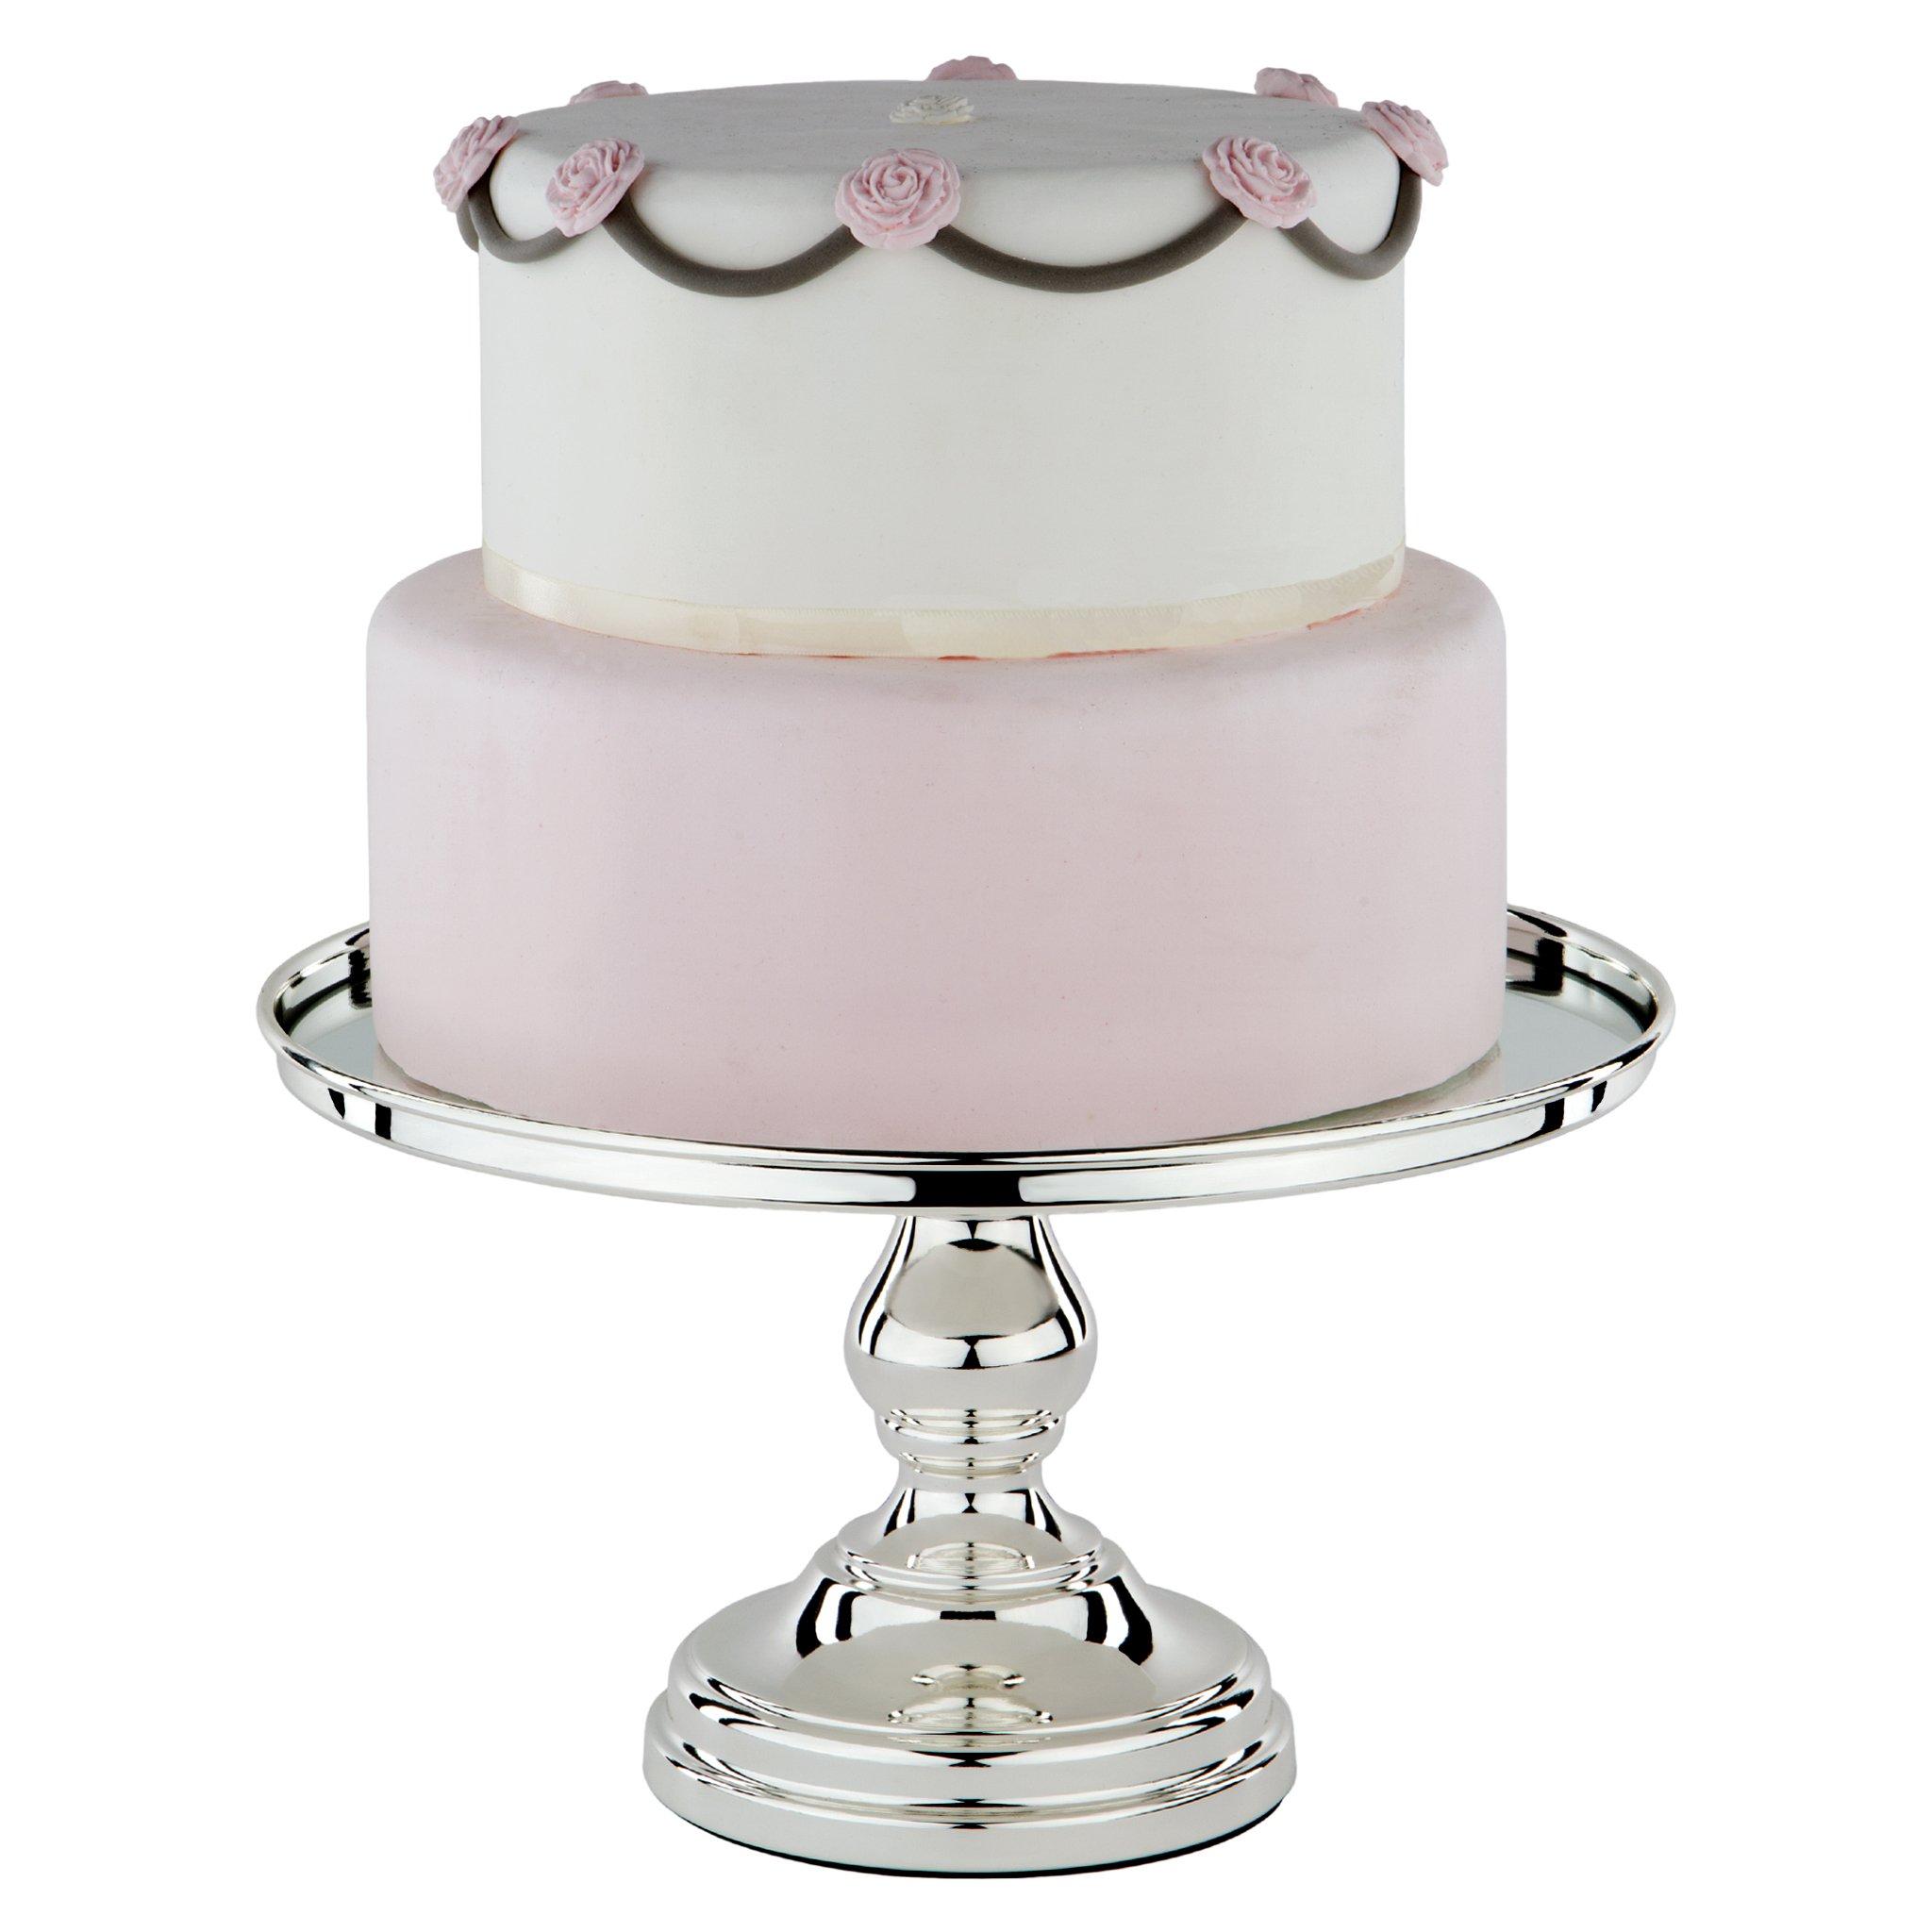 Amazon.com: Amalfi Decor: CAKE STANDS